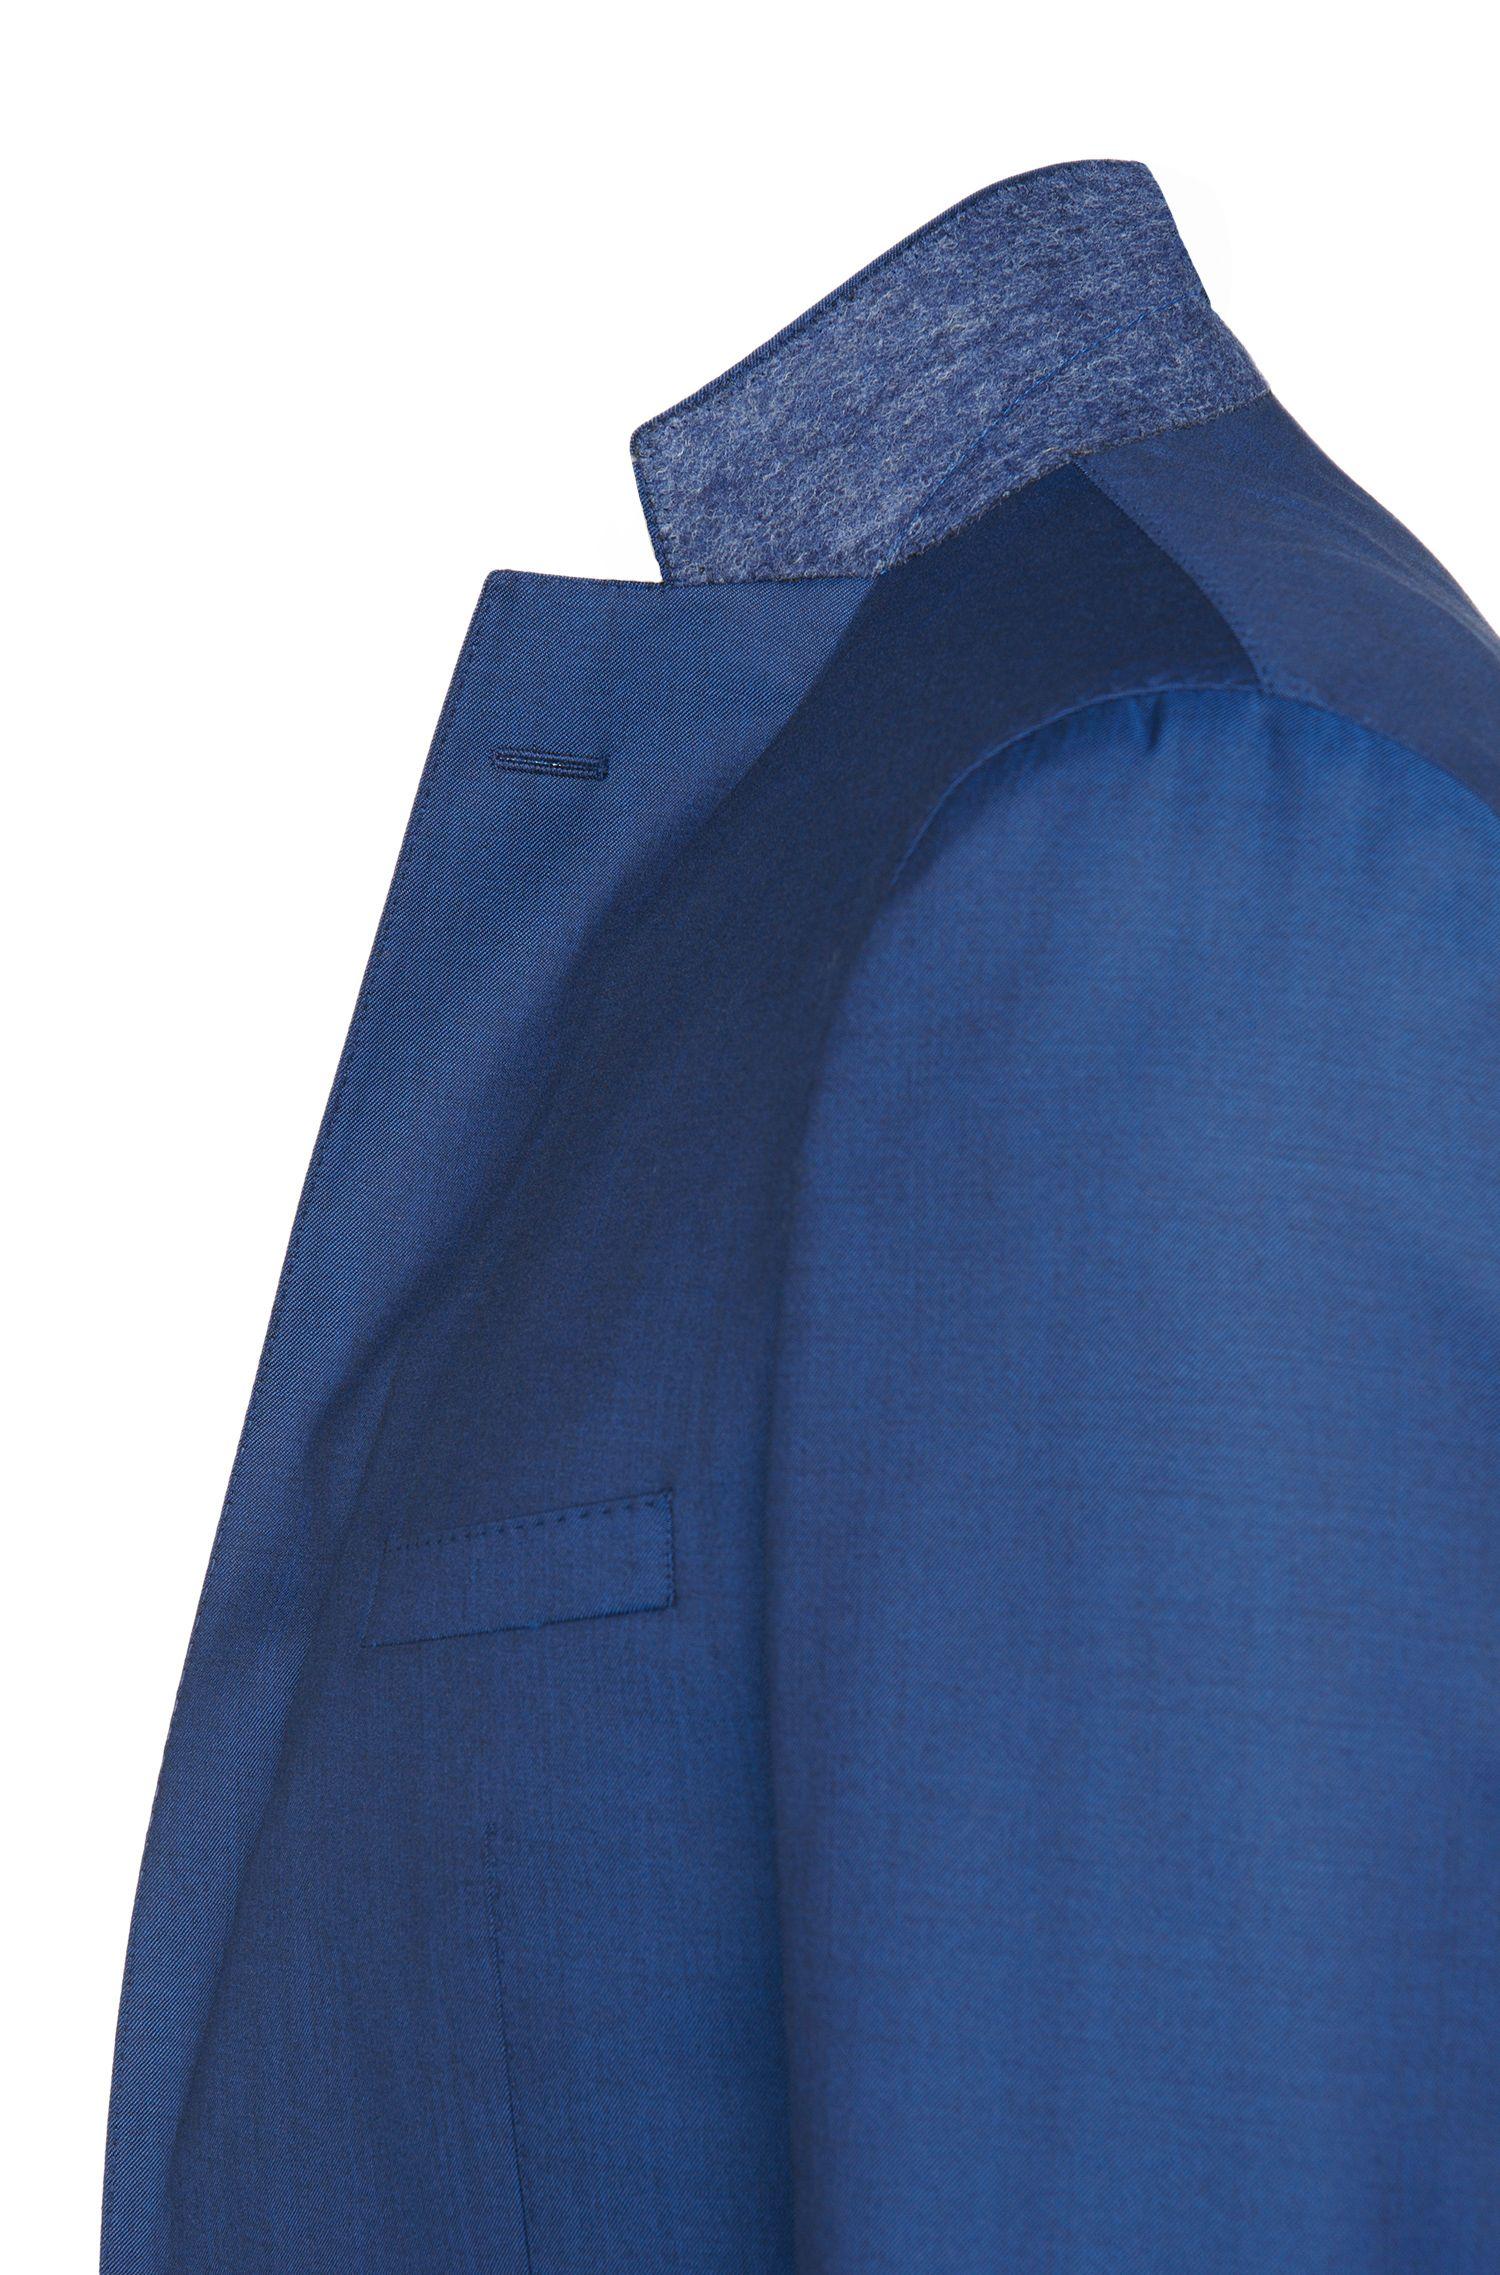 Costume extra Slim Fit en pure laine vierge: «Reyno2/Wave1»